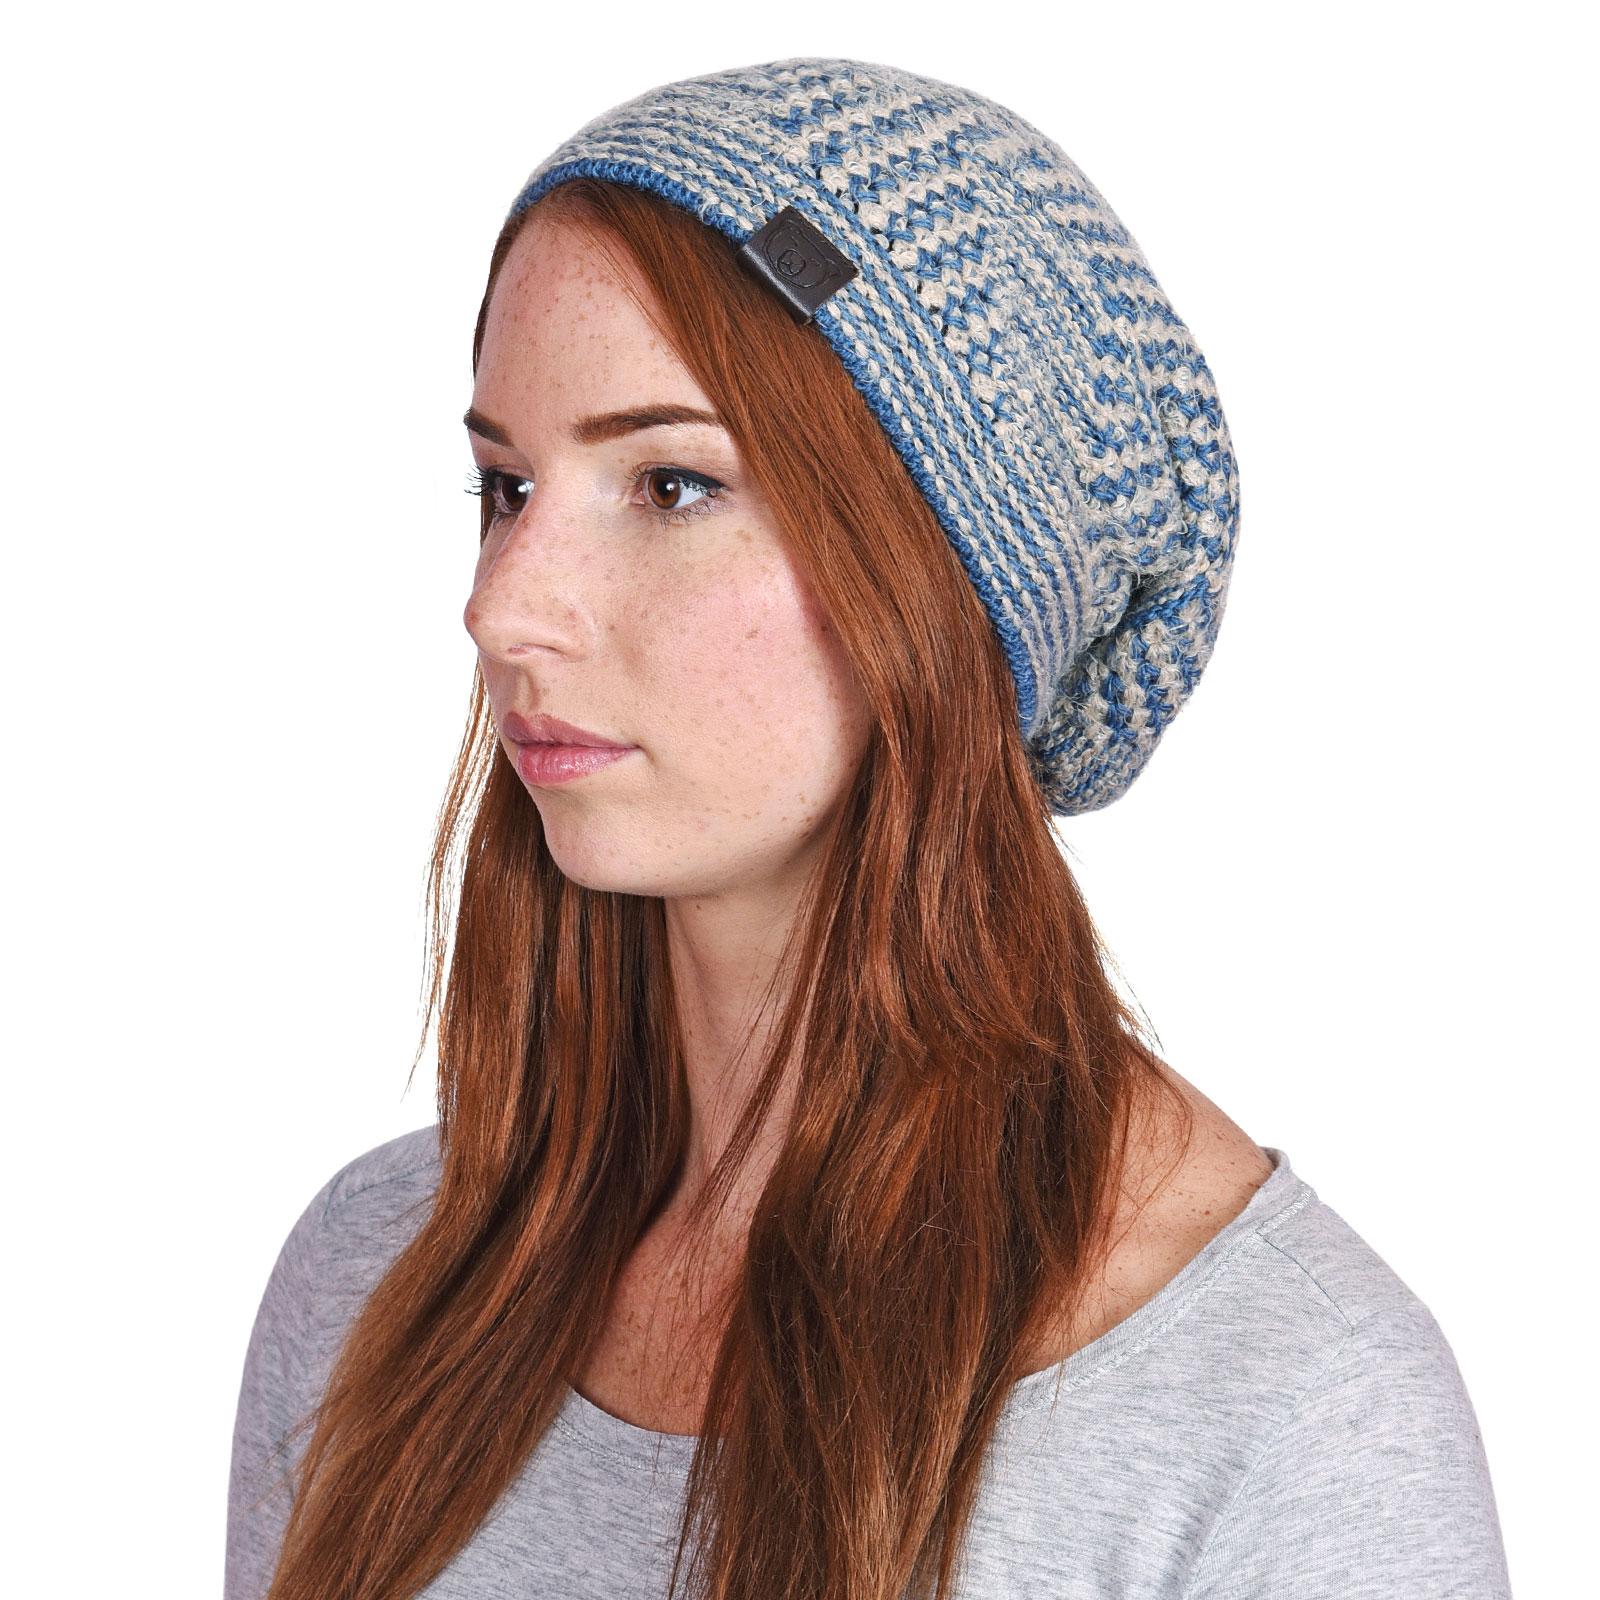 CP-01049-VF16-P-bonnet-femme-hiver-bleu